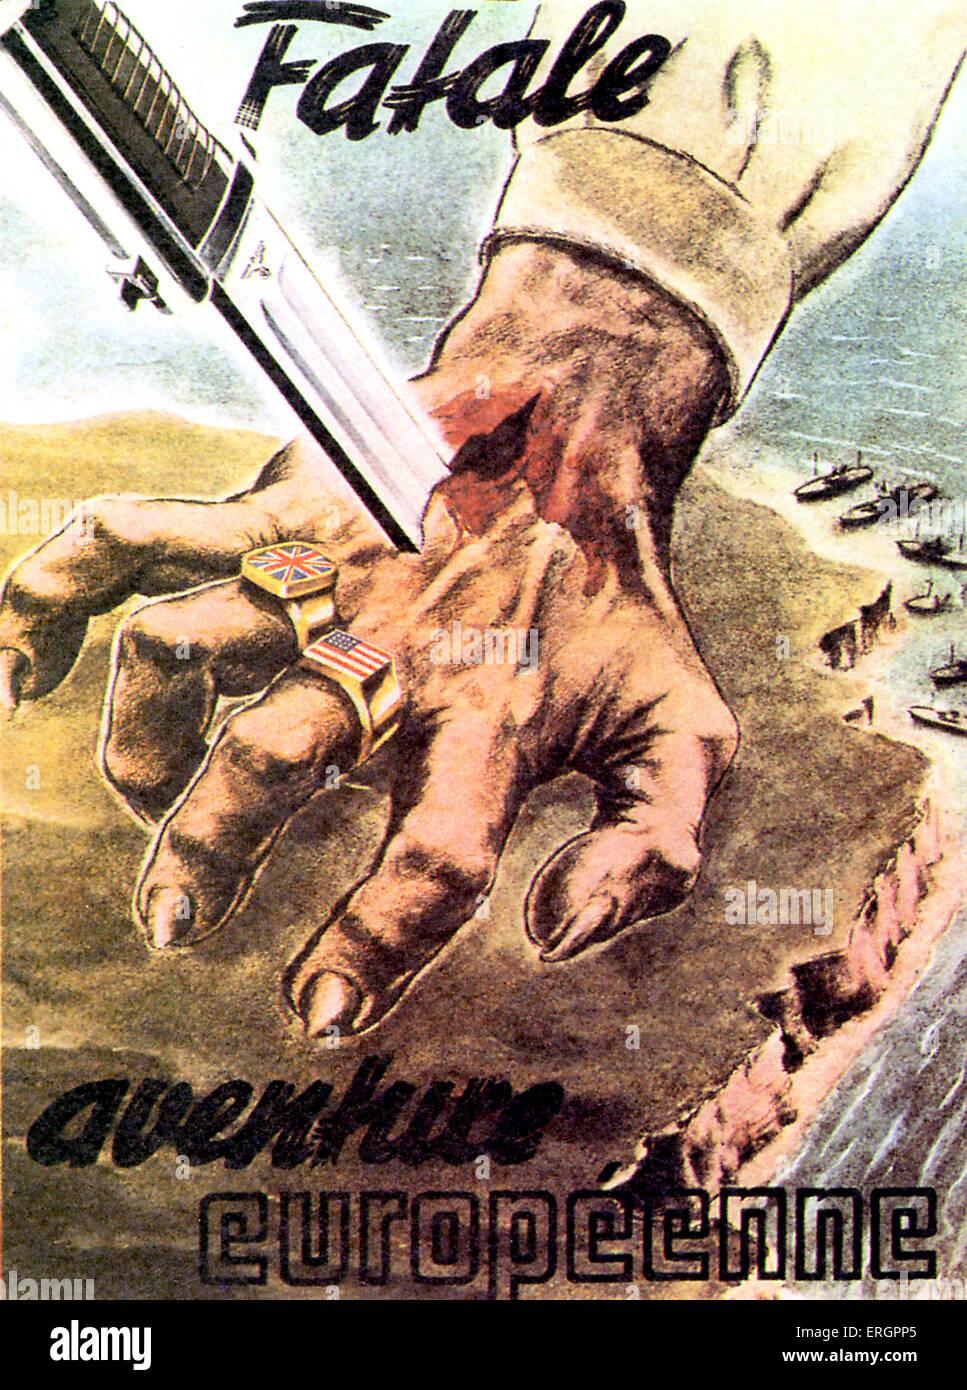 WW2 - Anti allies propaganda. 'Fatale aventure europeenne' / Fatal European adventure. A knife stabs through - Stock Image